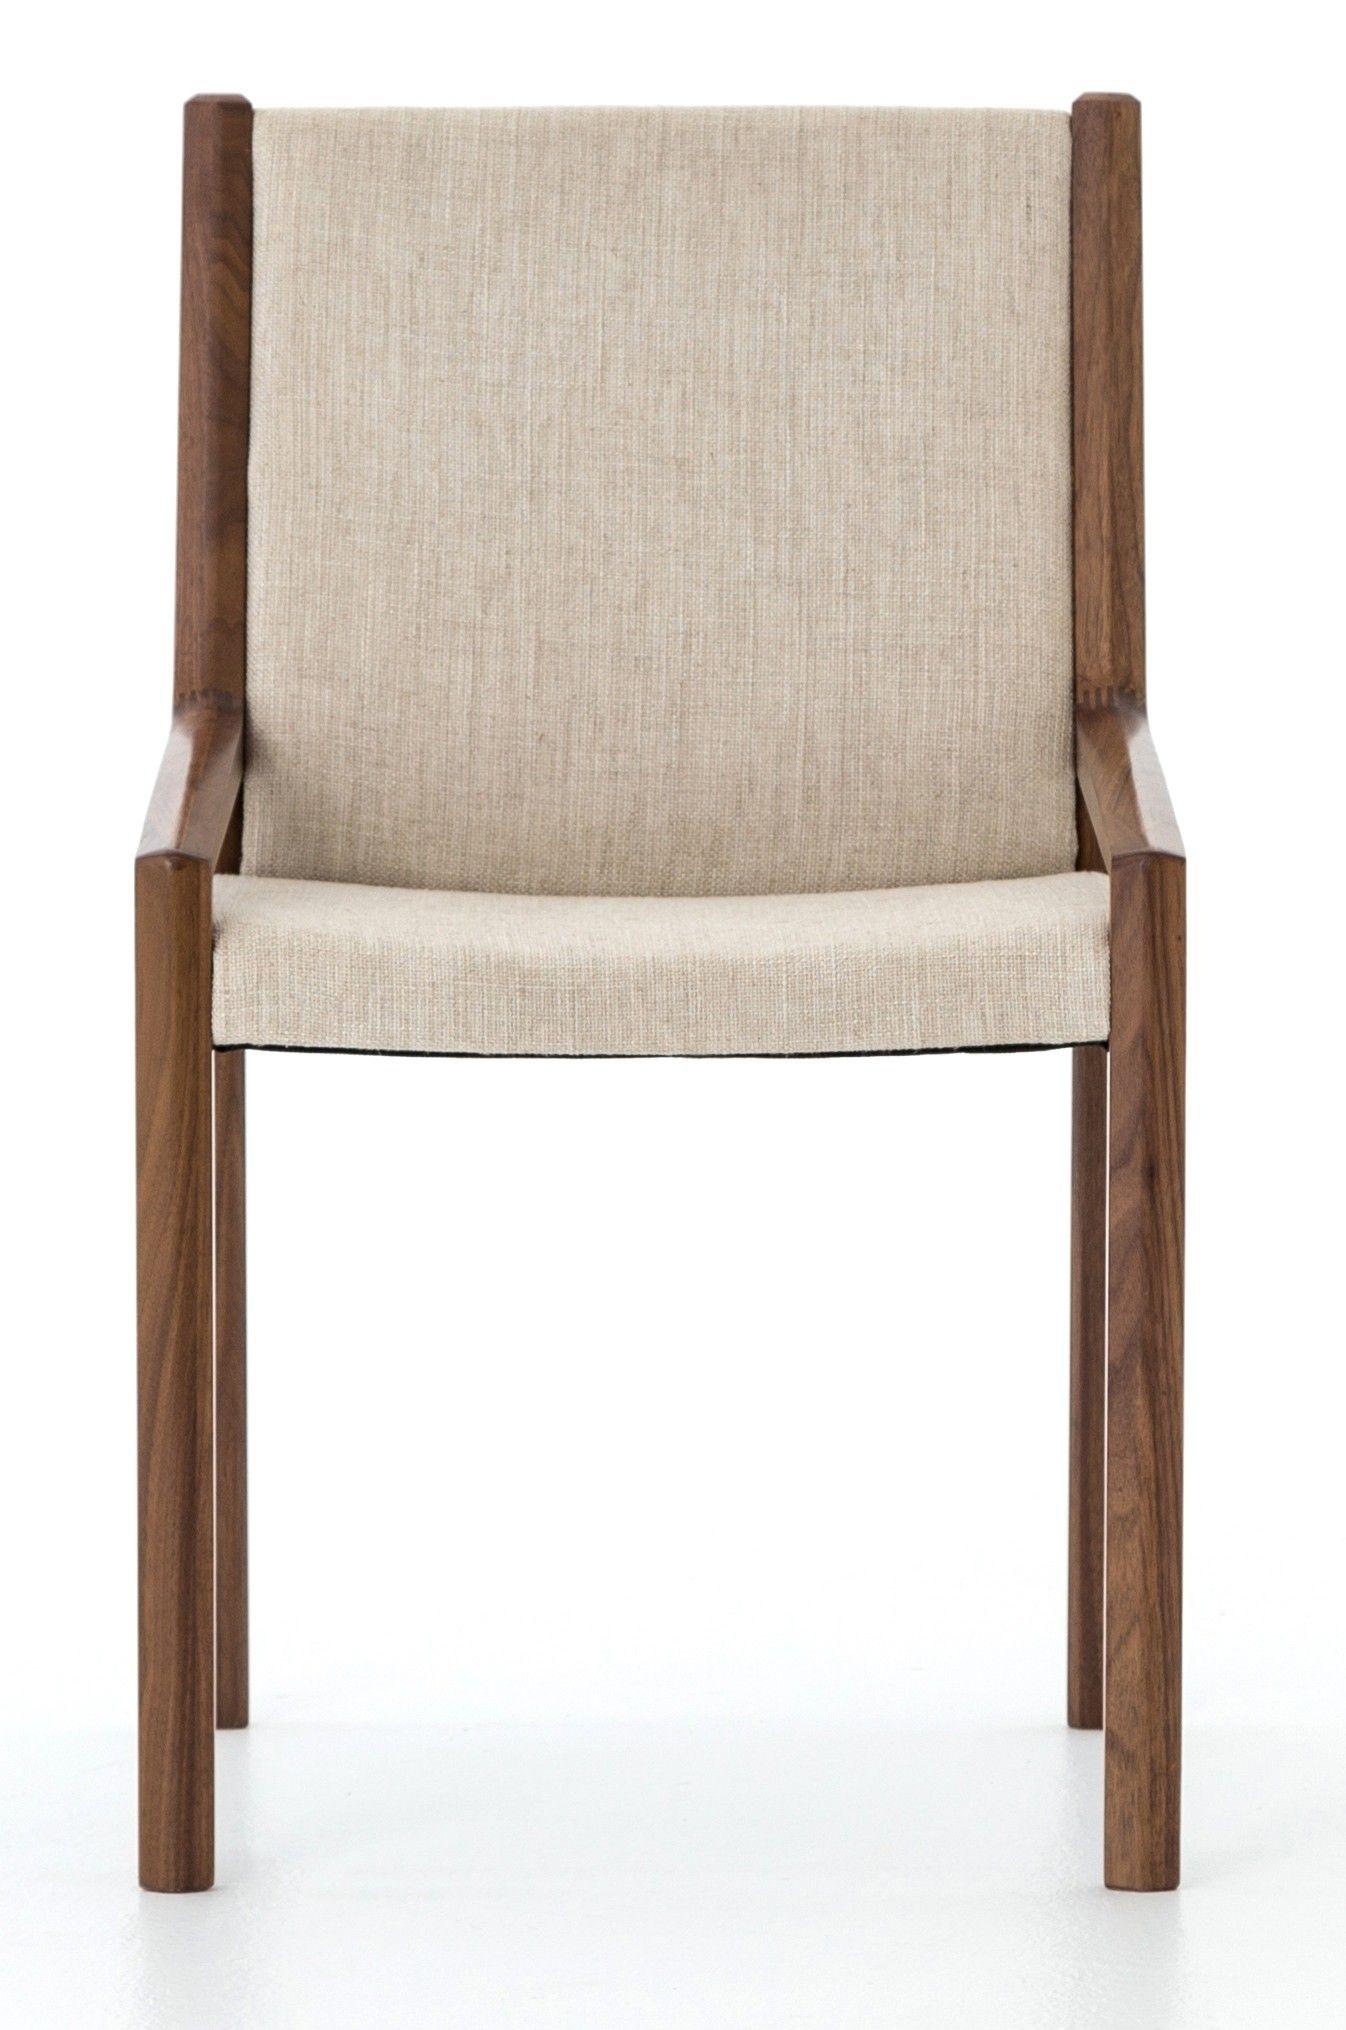 Edette Dining Chair Walnut Oak Dining Chairs Chair Walnut